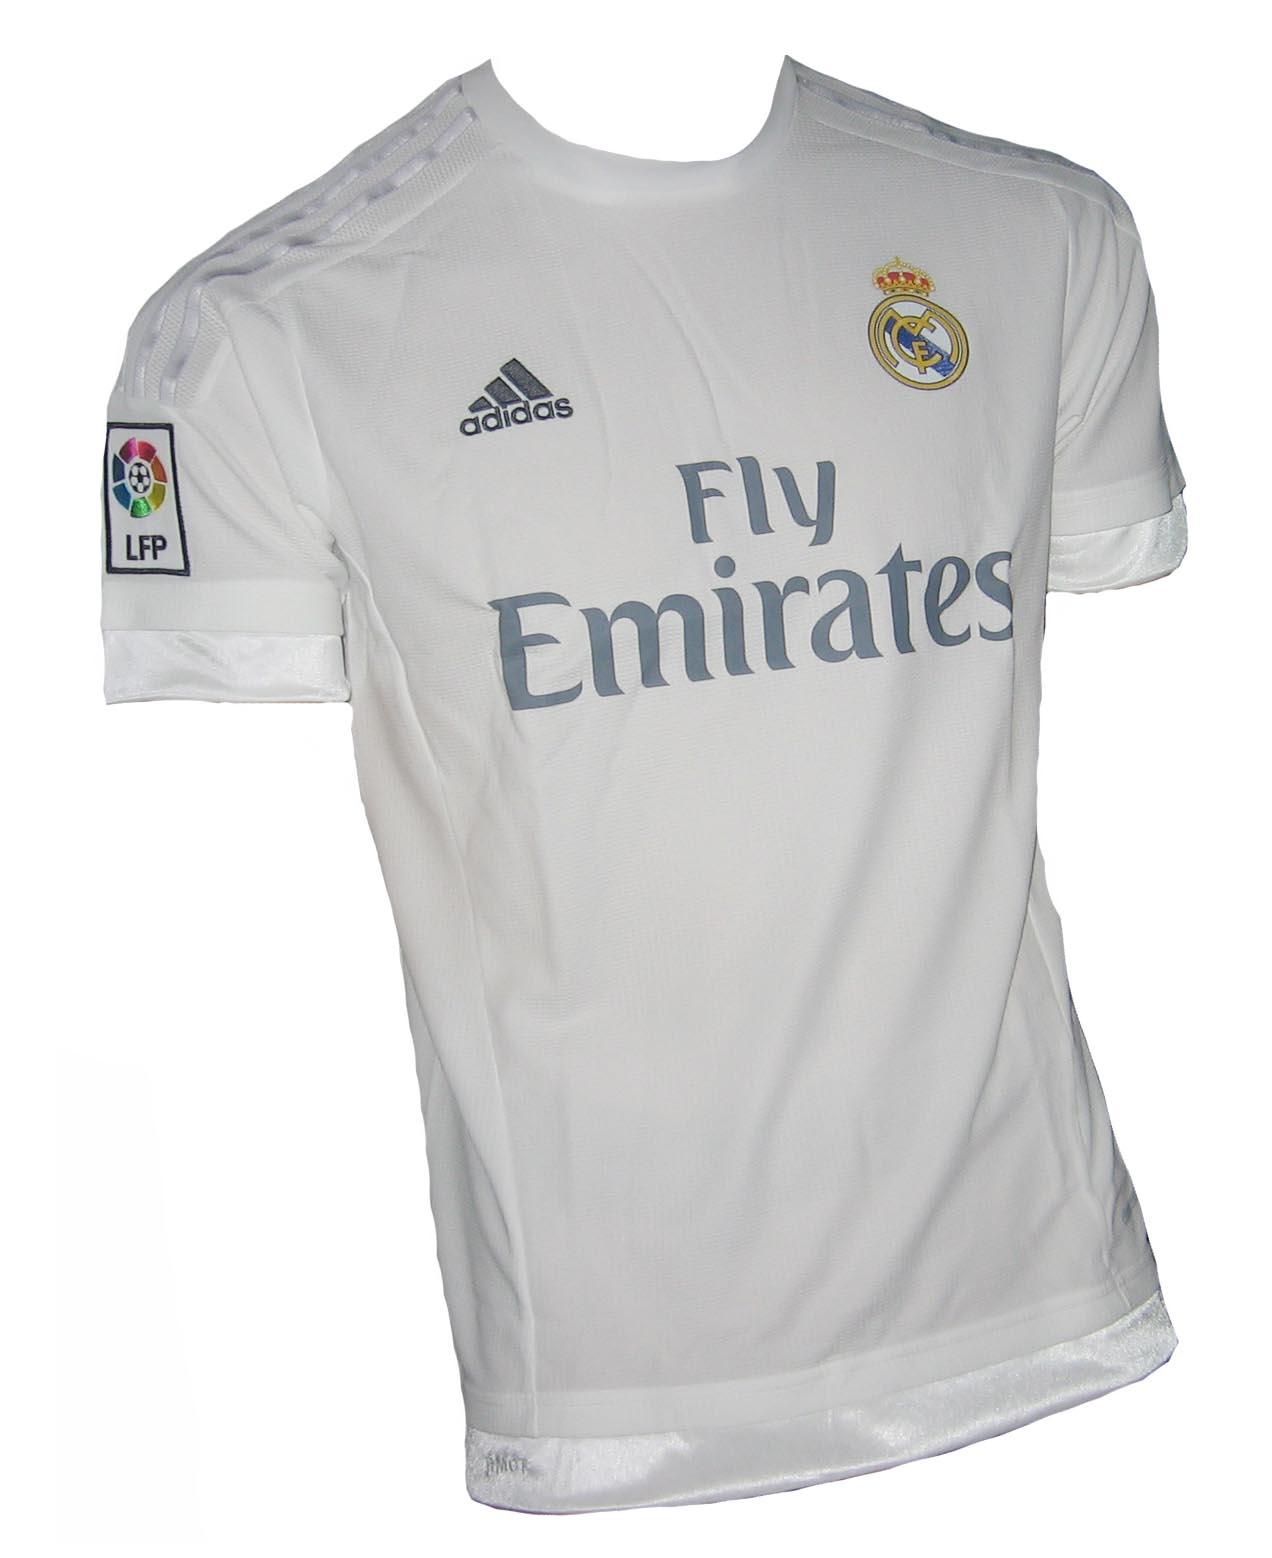 e3c66263b Real Madrid Trikot 2015 16 Home Adidas - House of Shirts